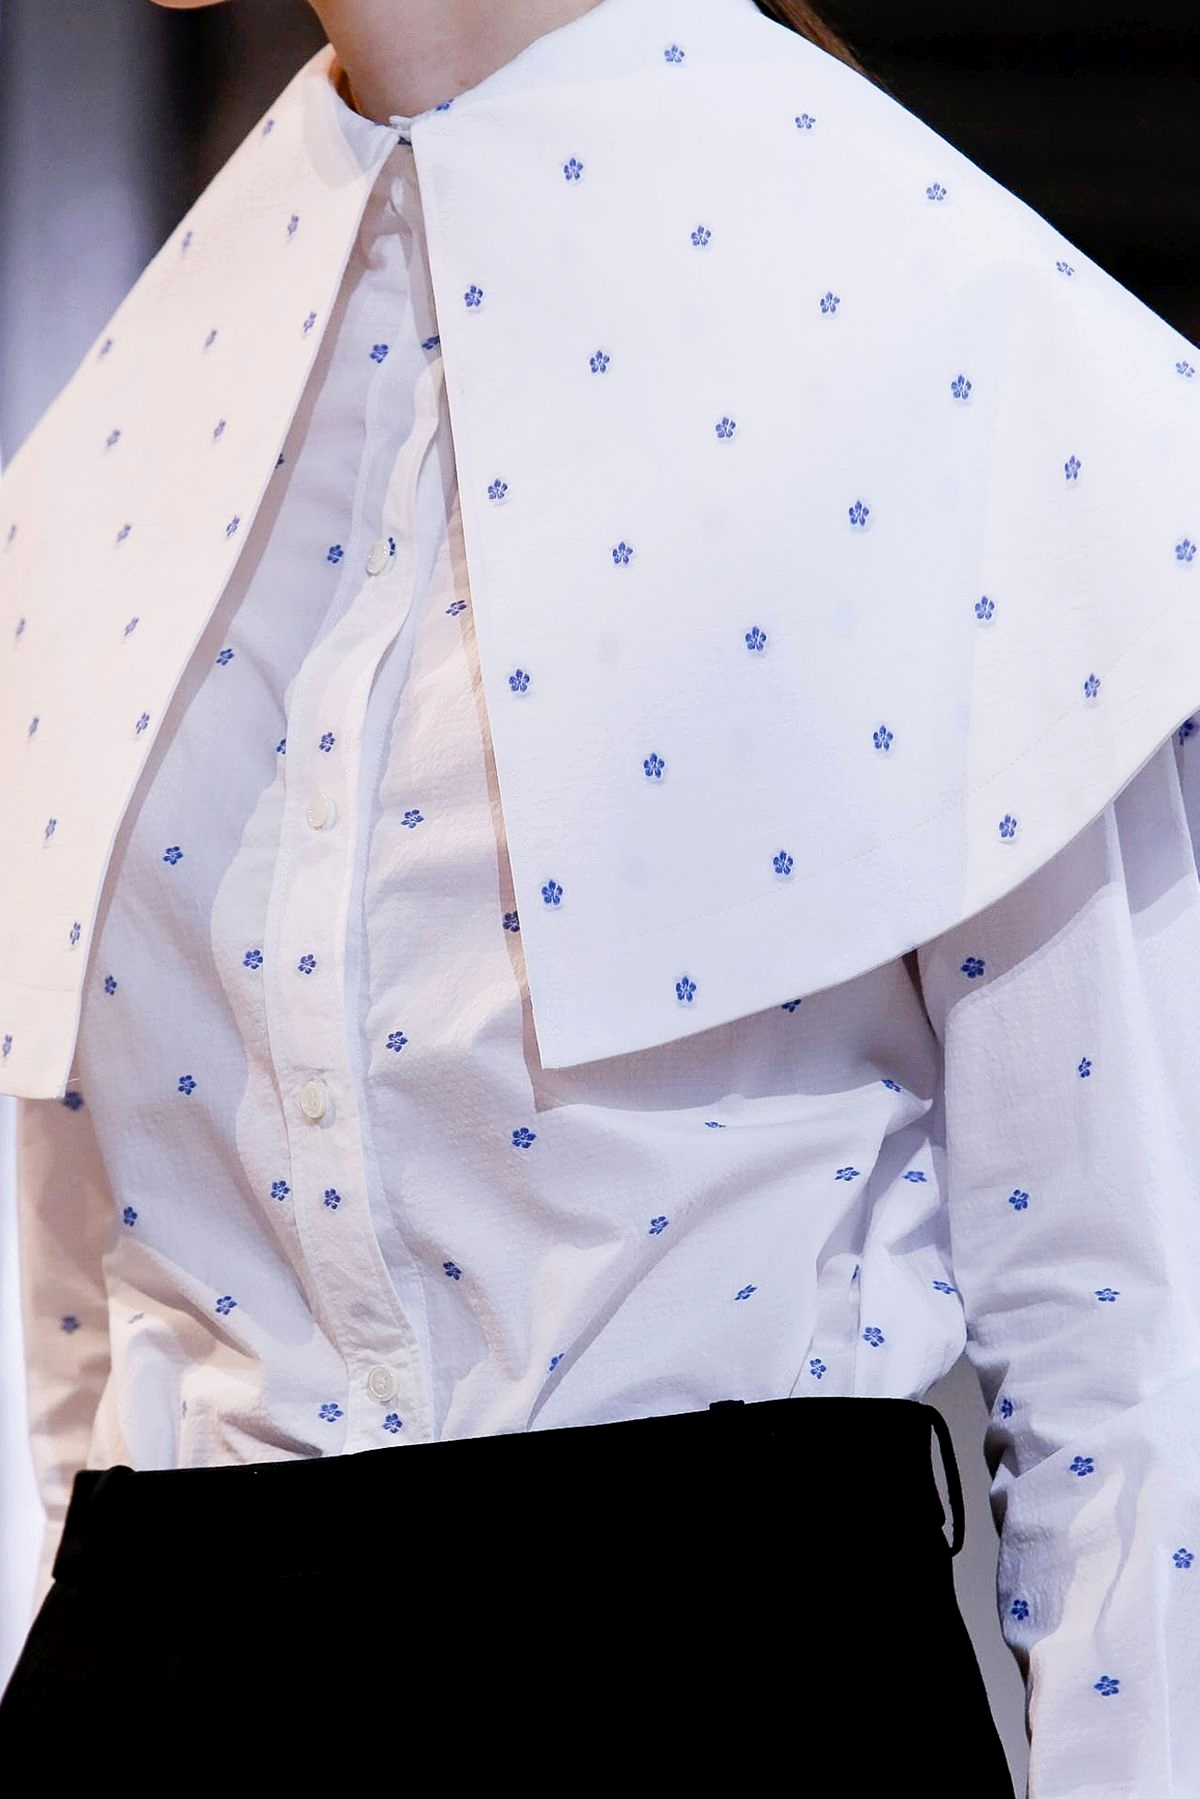 Nina Ricci Spring/Summer 2020 Ready-to-Wear